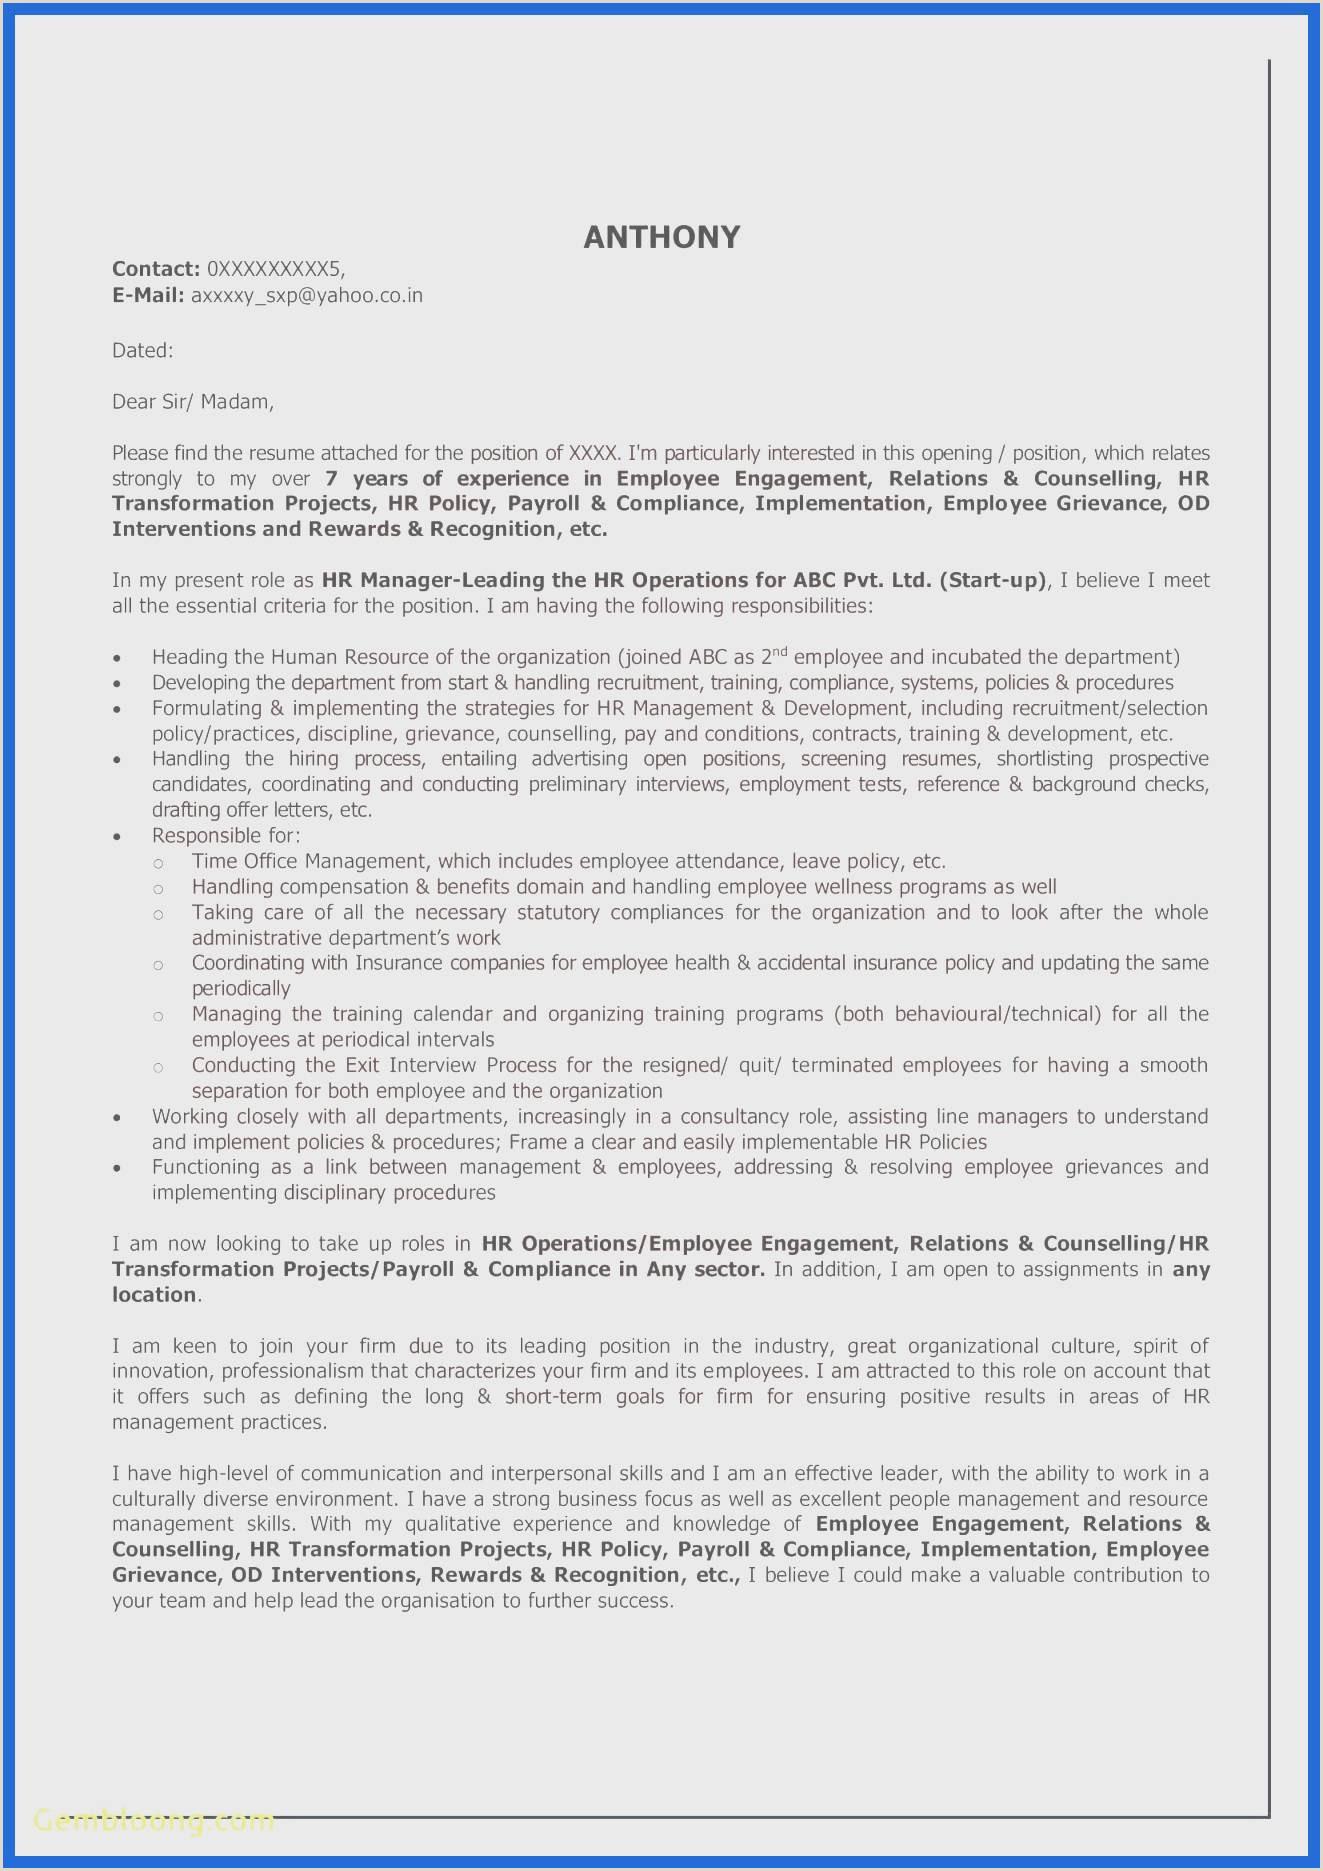 Exemple De Cv Open Office A Telecharger Modele Cv Open Fice Meilleur De 10 Open Fice Resume